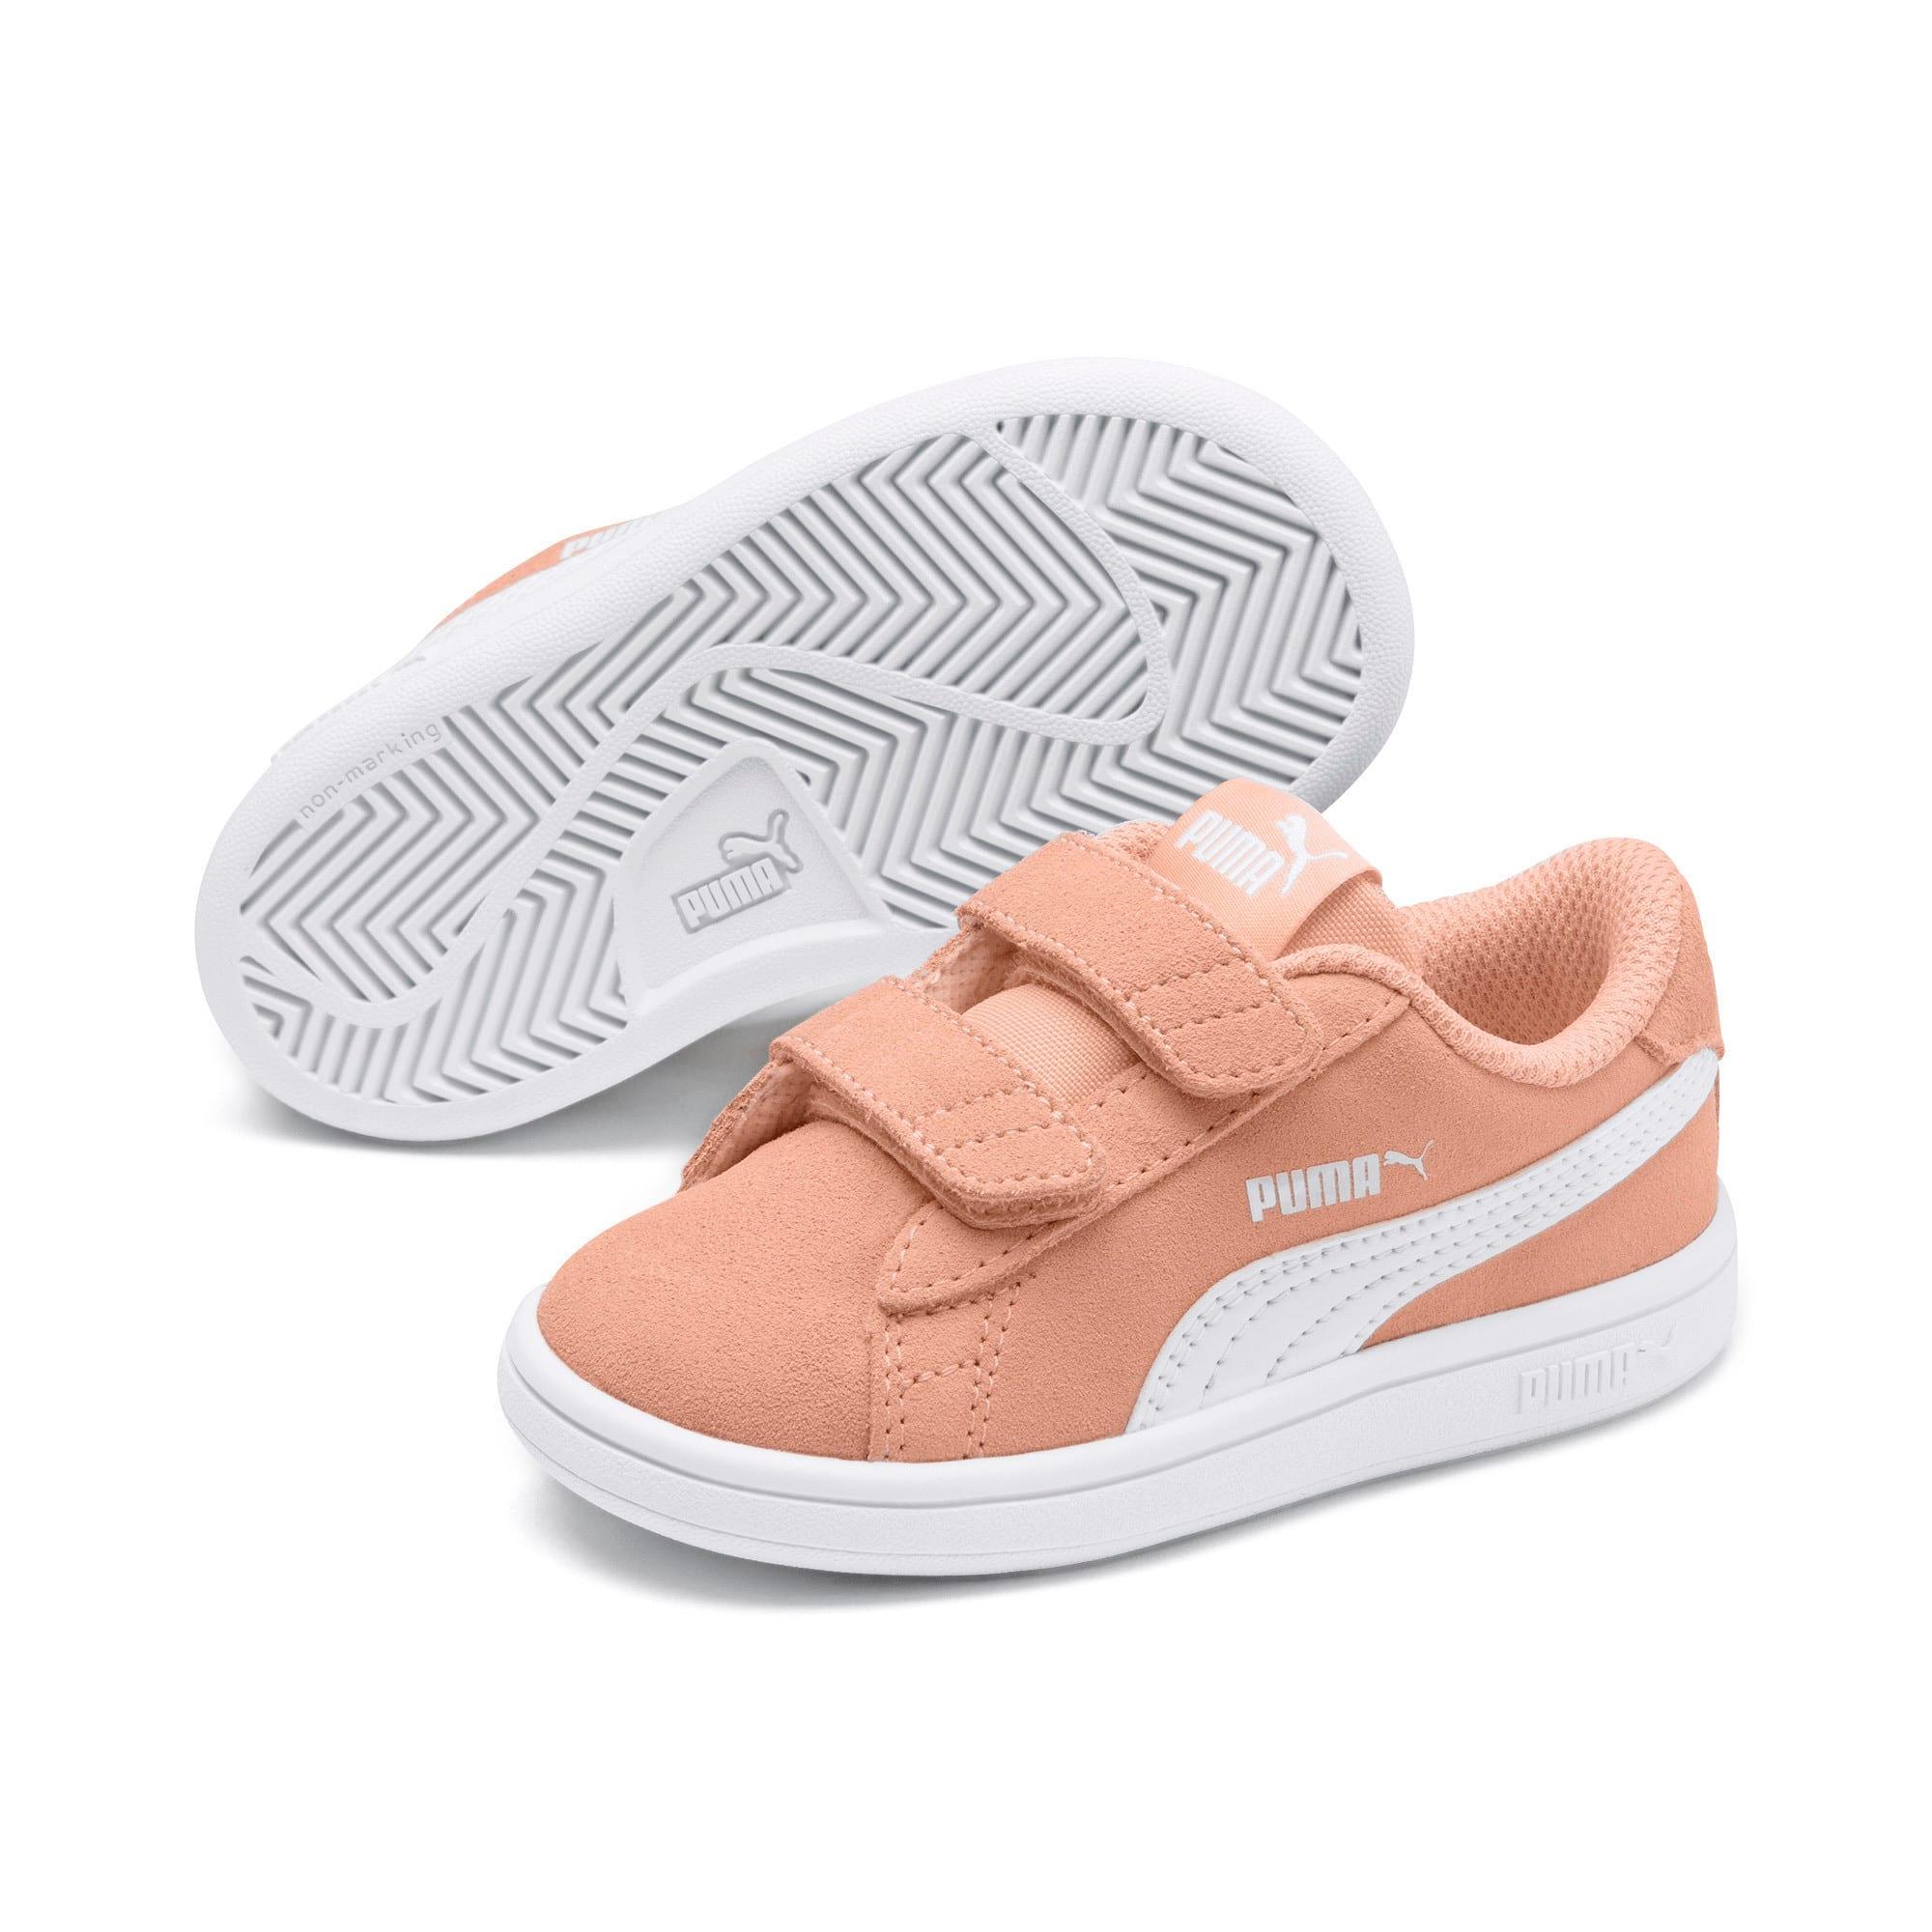 Thumbnail 2 of PUMA Smash v2 Suede Toddler Shoes, Peach Parfait-Puma White, medium